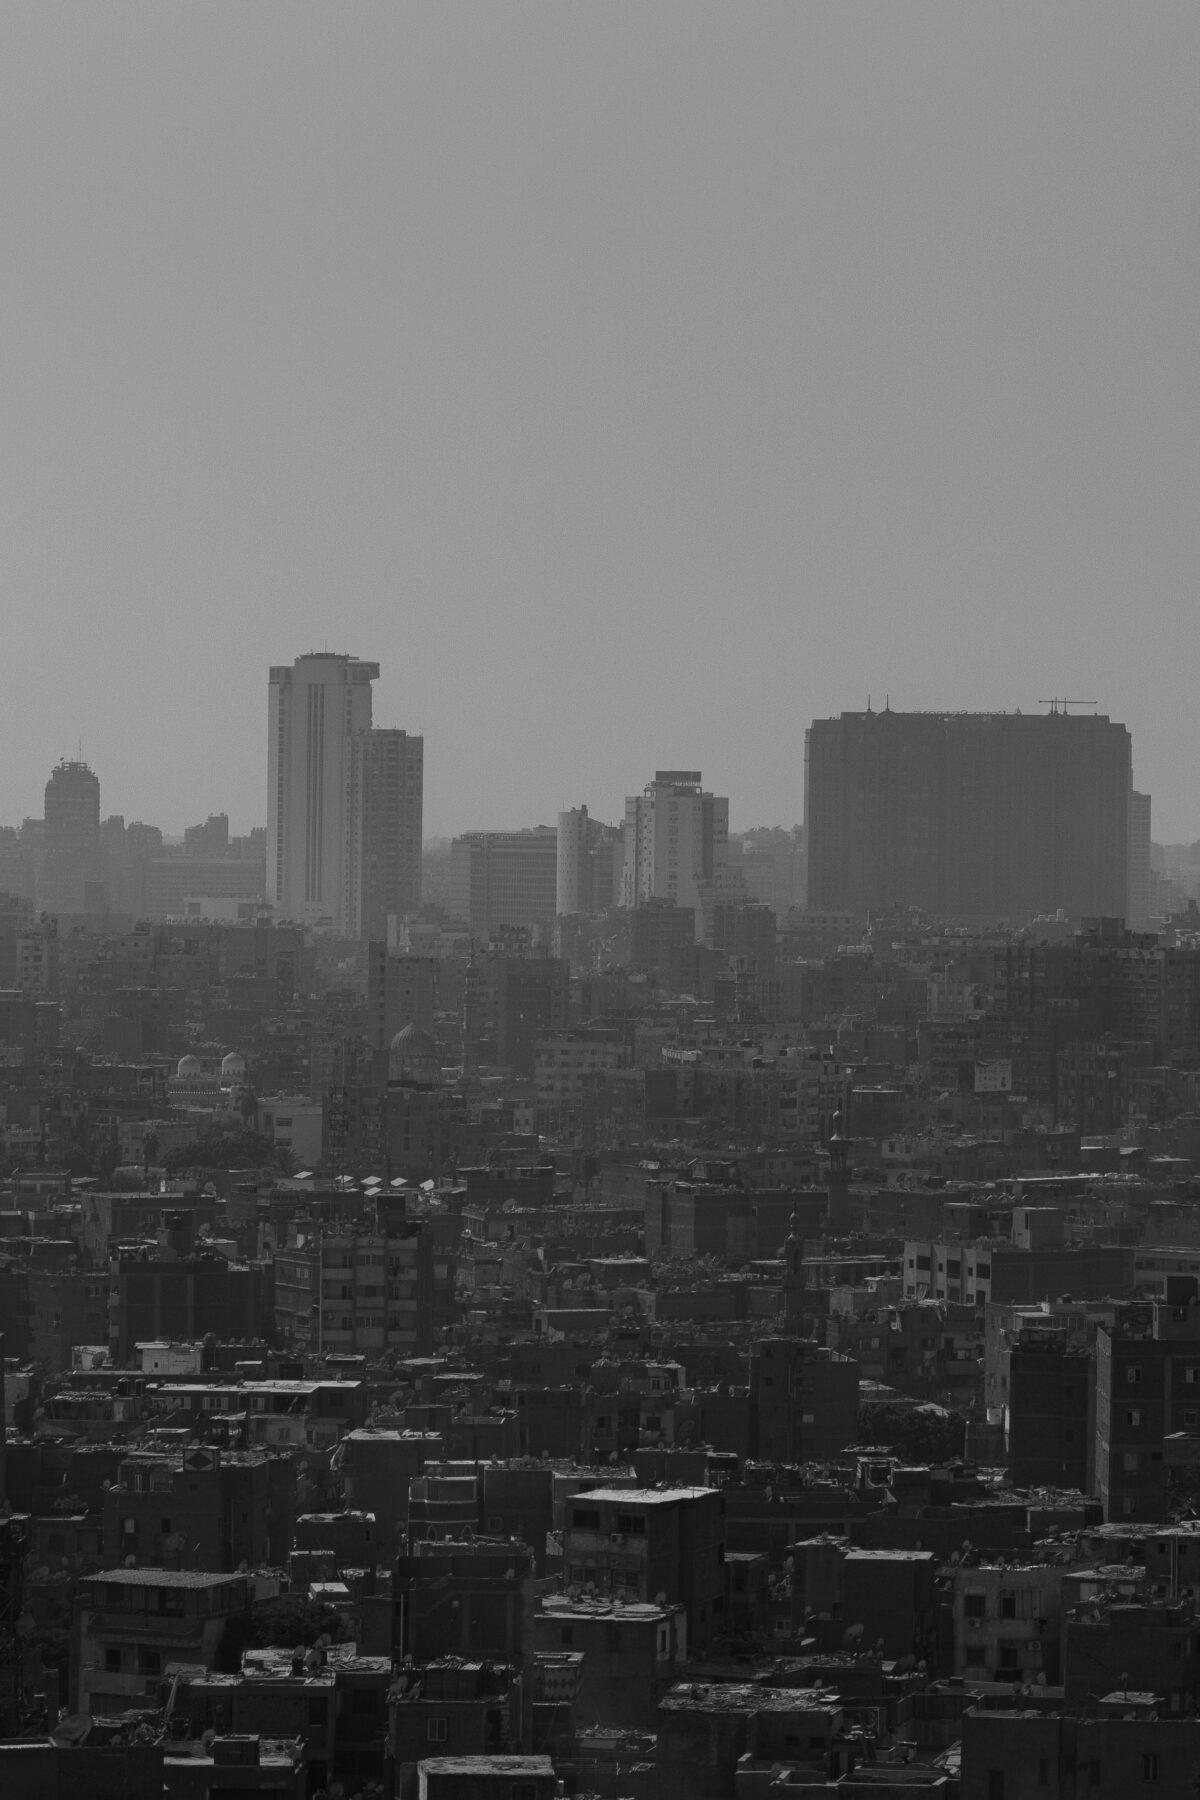 Cairo-yousef-salhamoud-unsplash